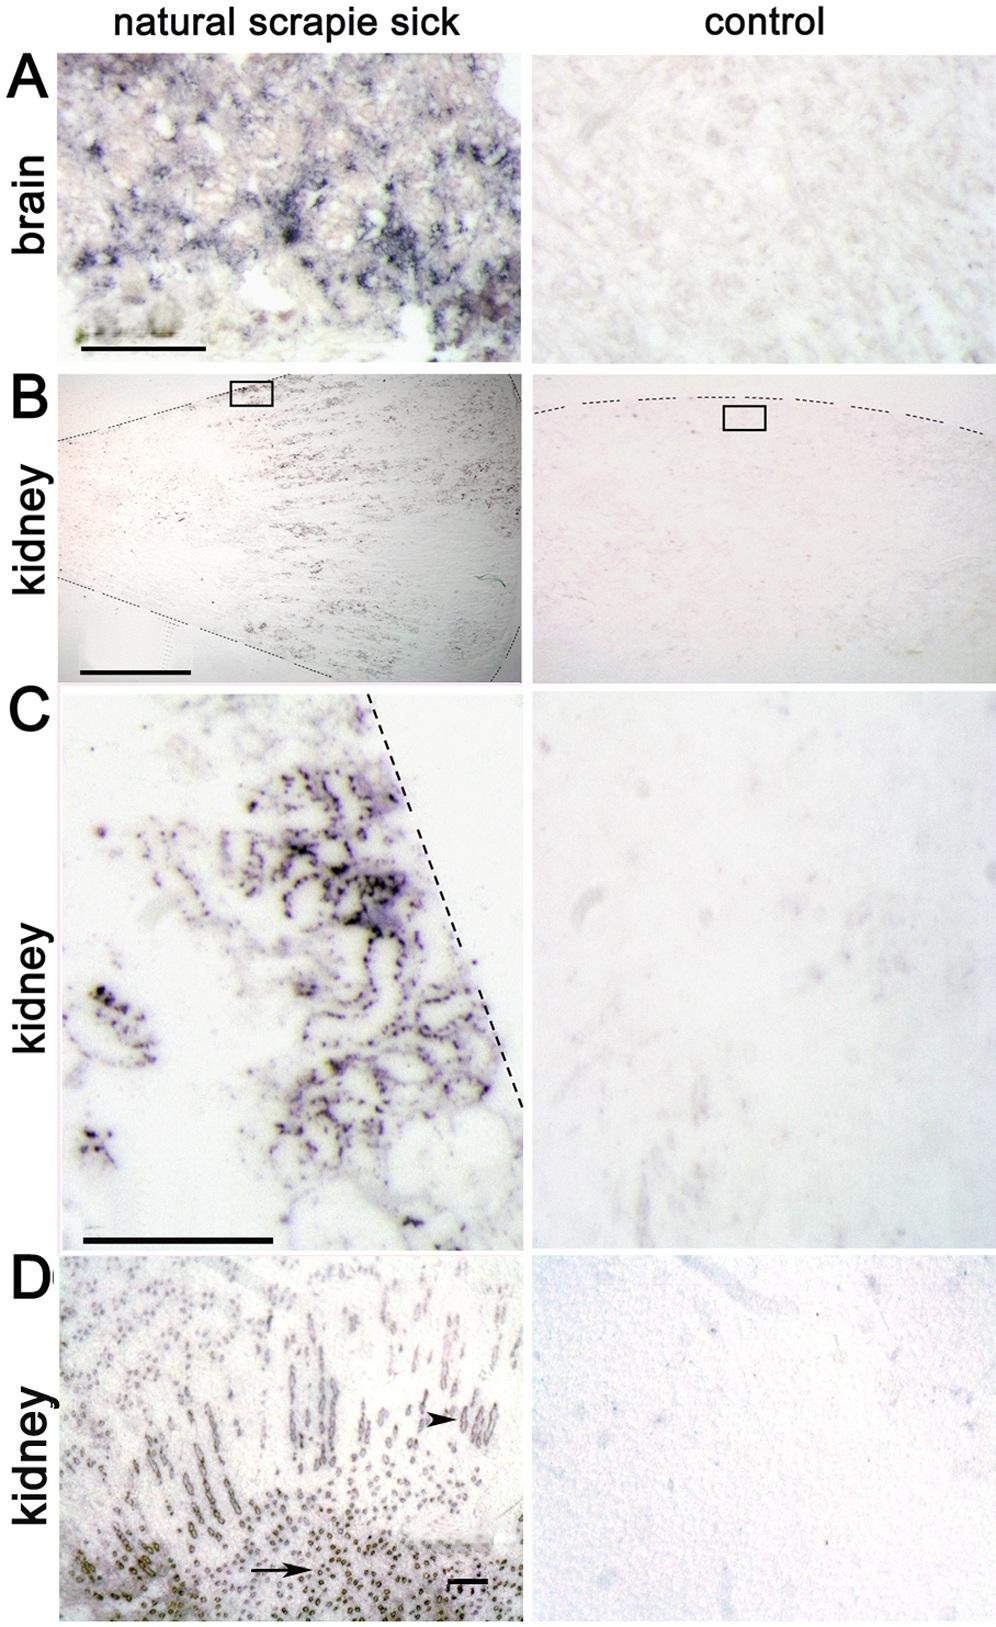 CD230 (Prpsc) Antibody | 2G11 gallery image 2